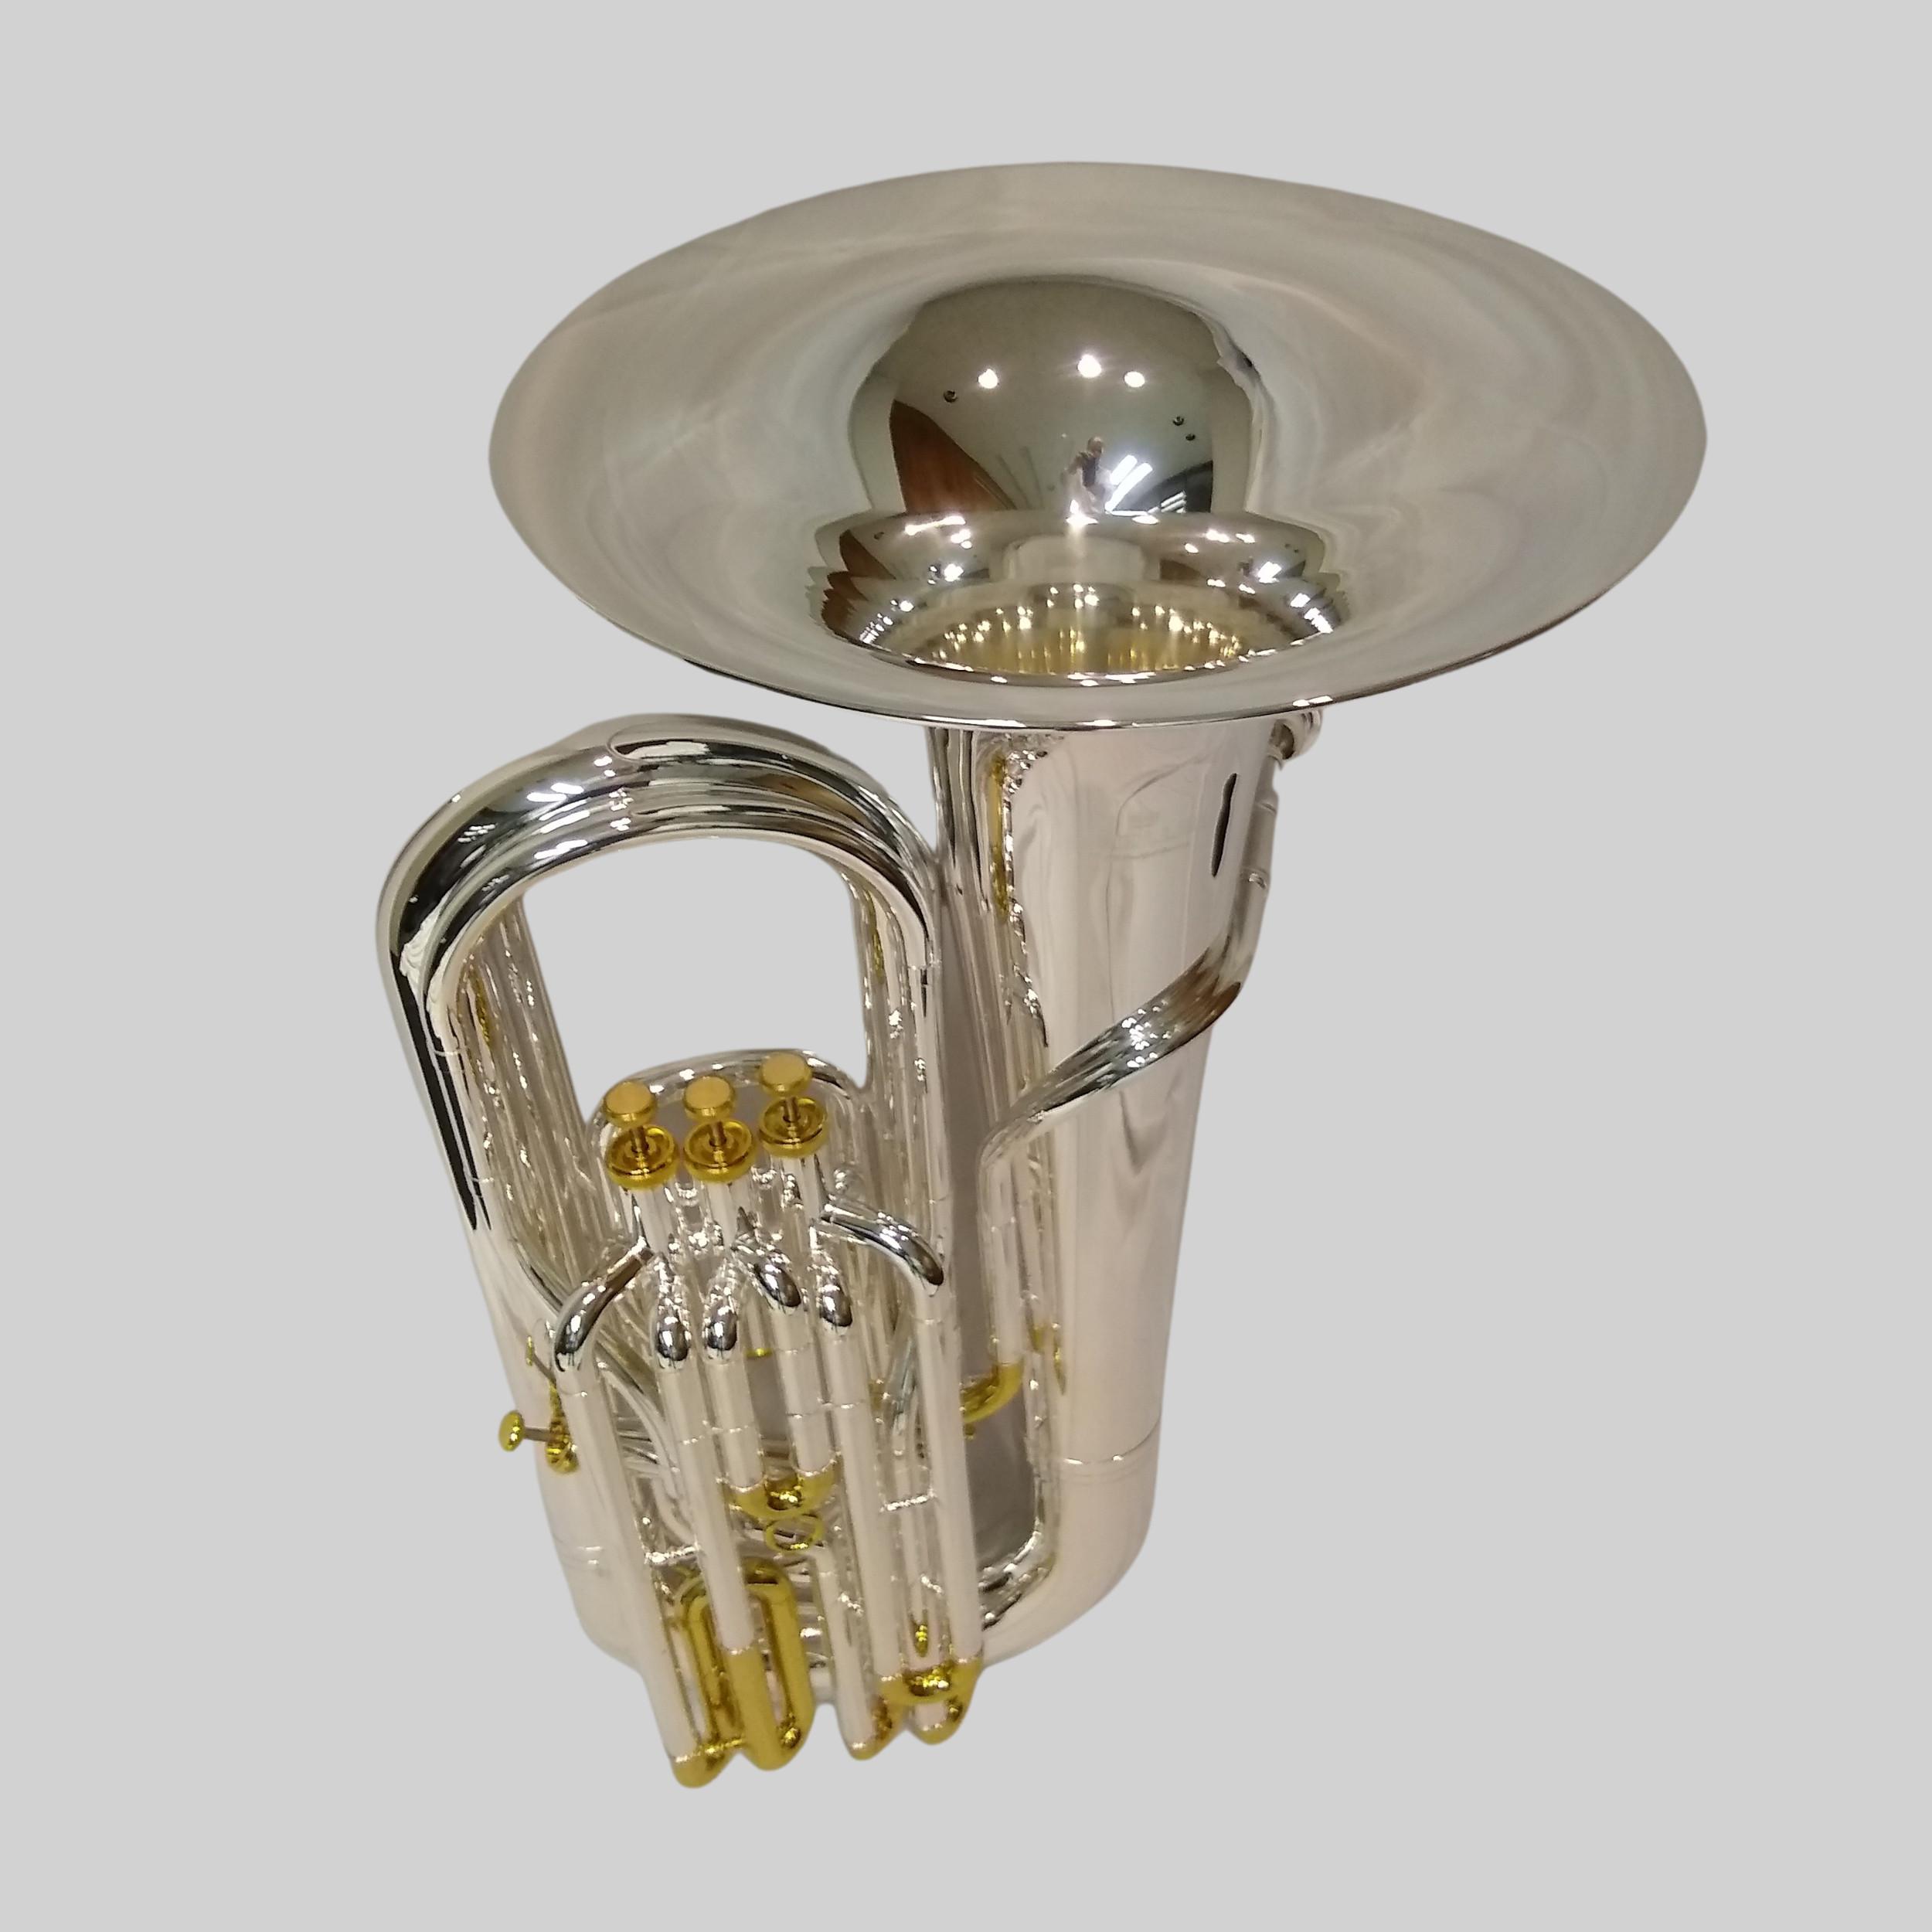 American Heritage 4 Valve Piston Sidekick CC Tuba – Silver/Gold